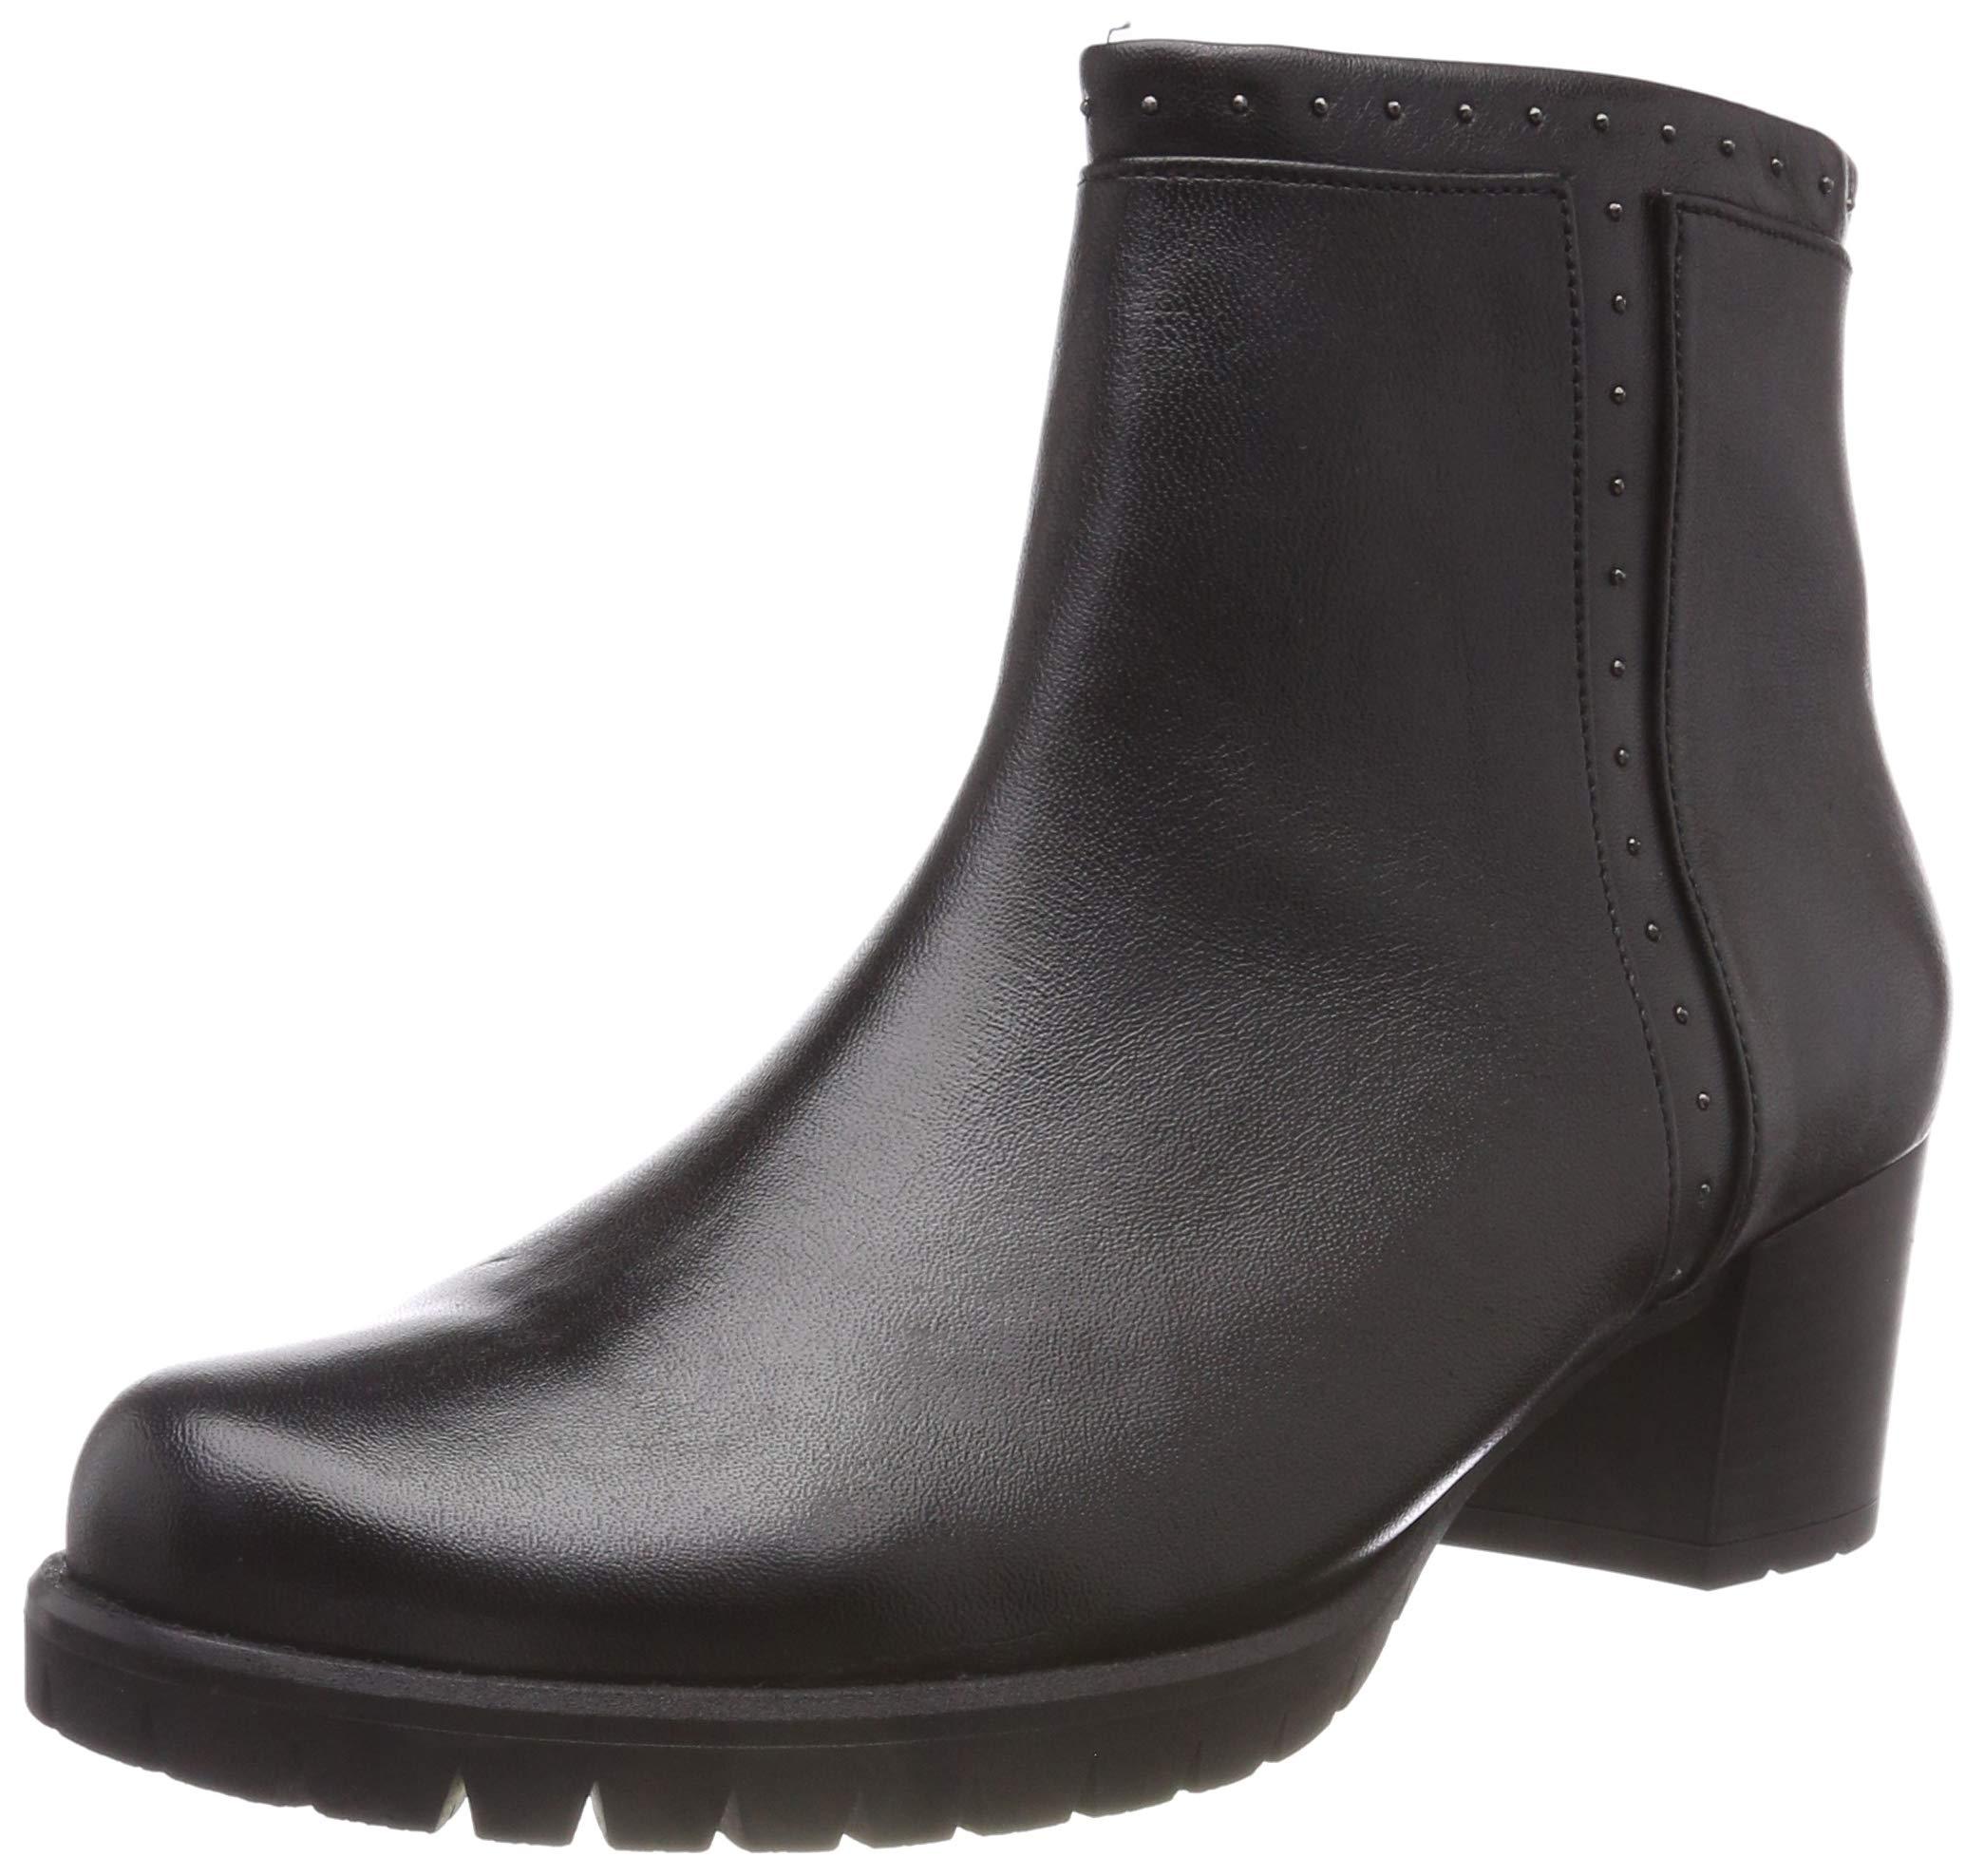 Gabor BasicBotines Shoes 5 Comfort Eu FemmeNoirschwarzmicro2740 tdhxsCoBQr